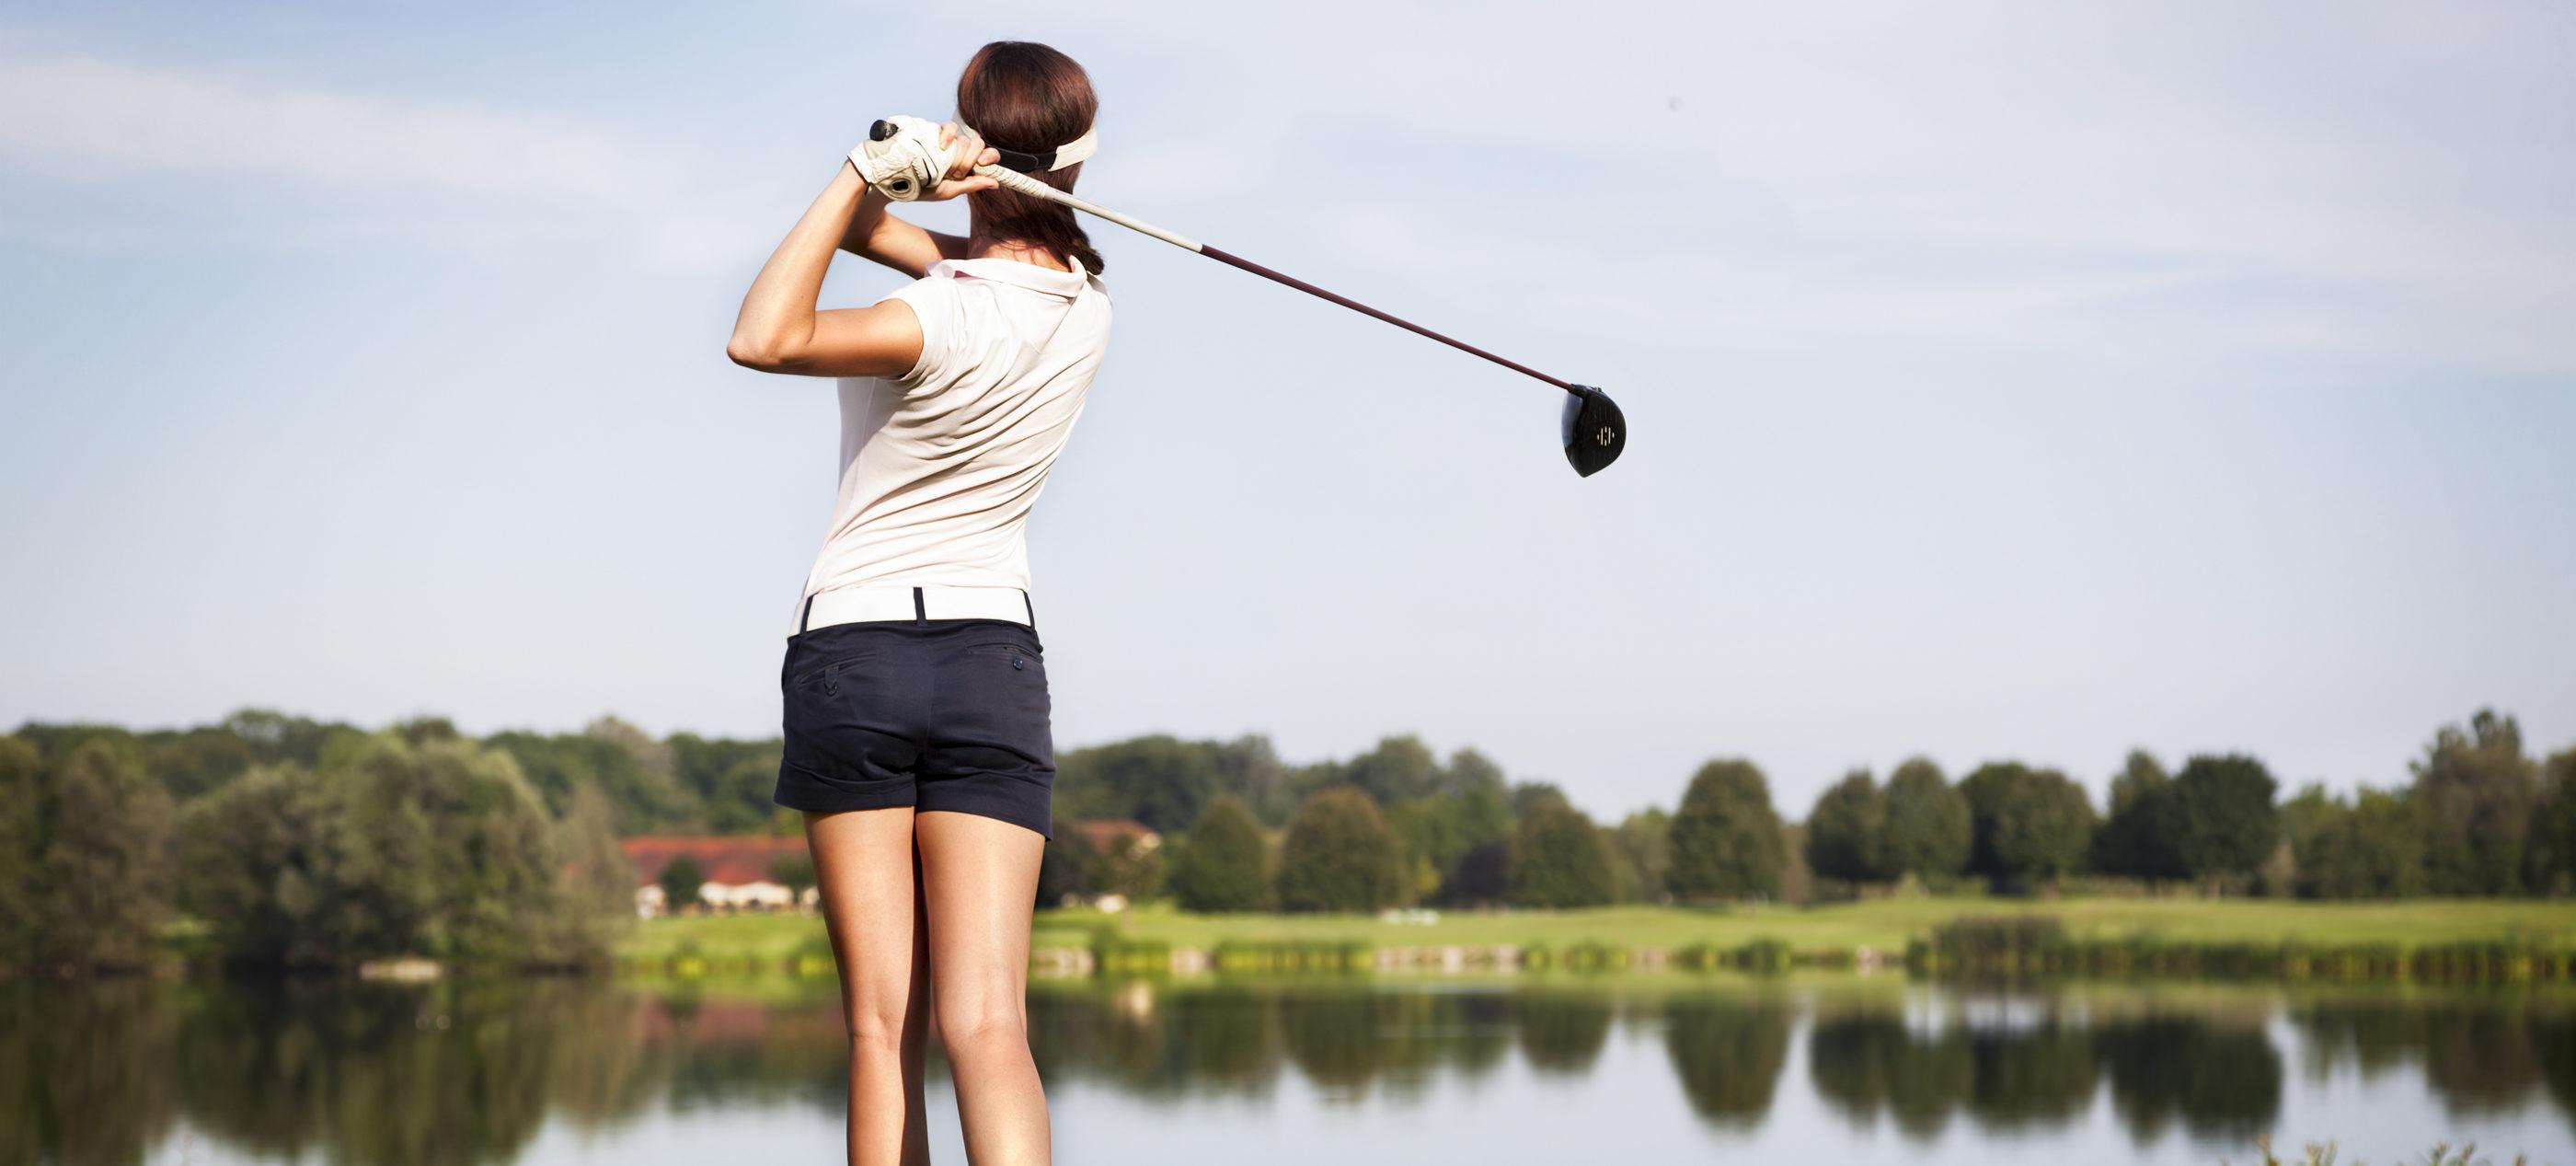 wellness new golf incentive travel survey